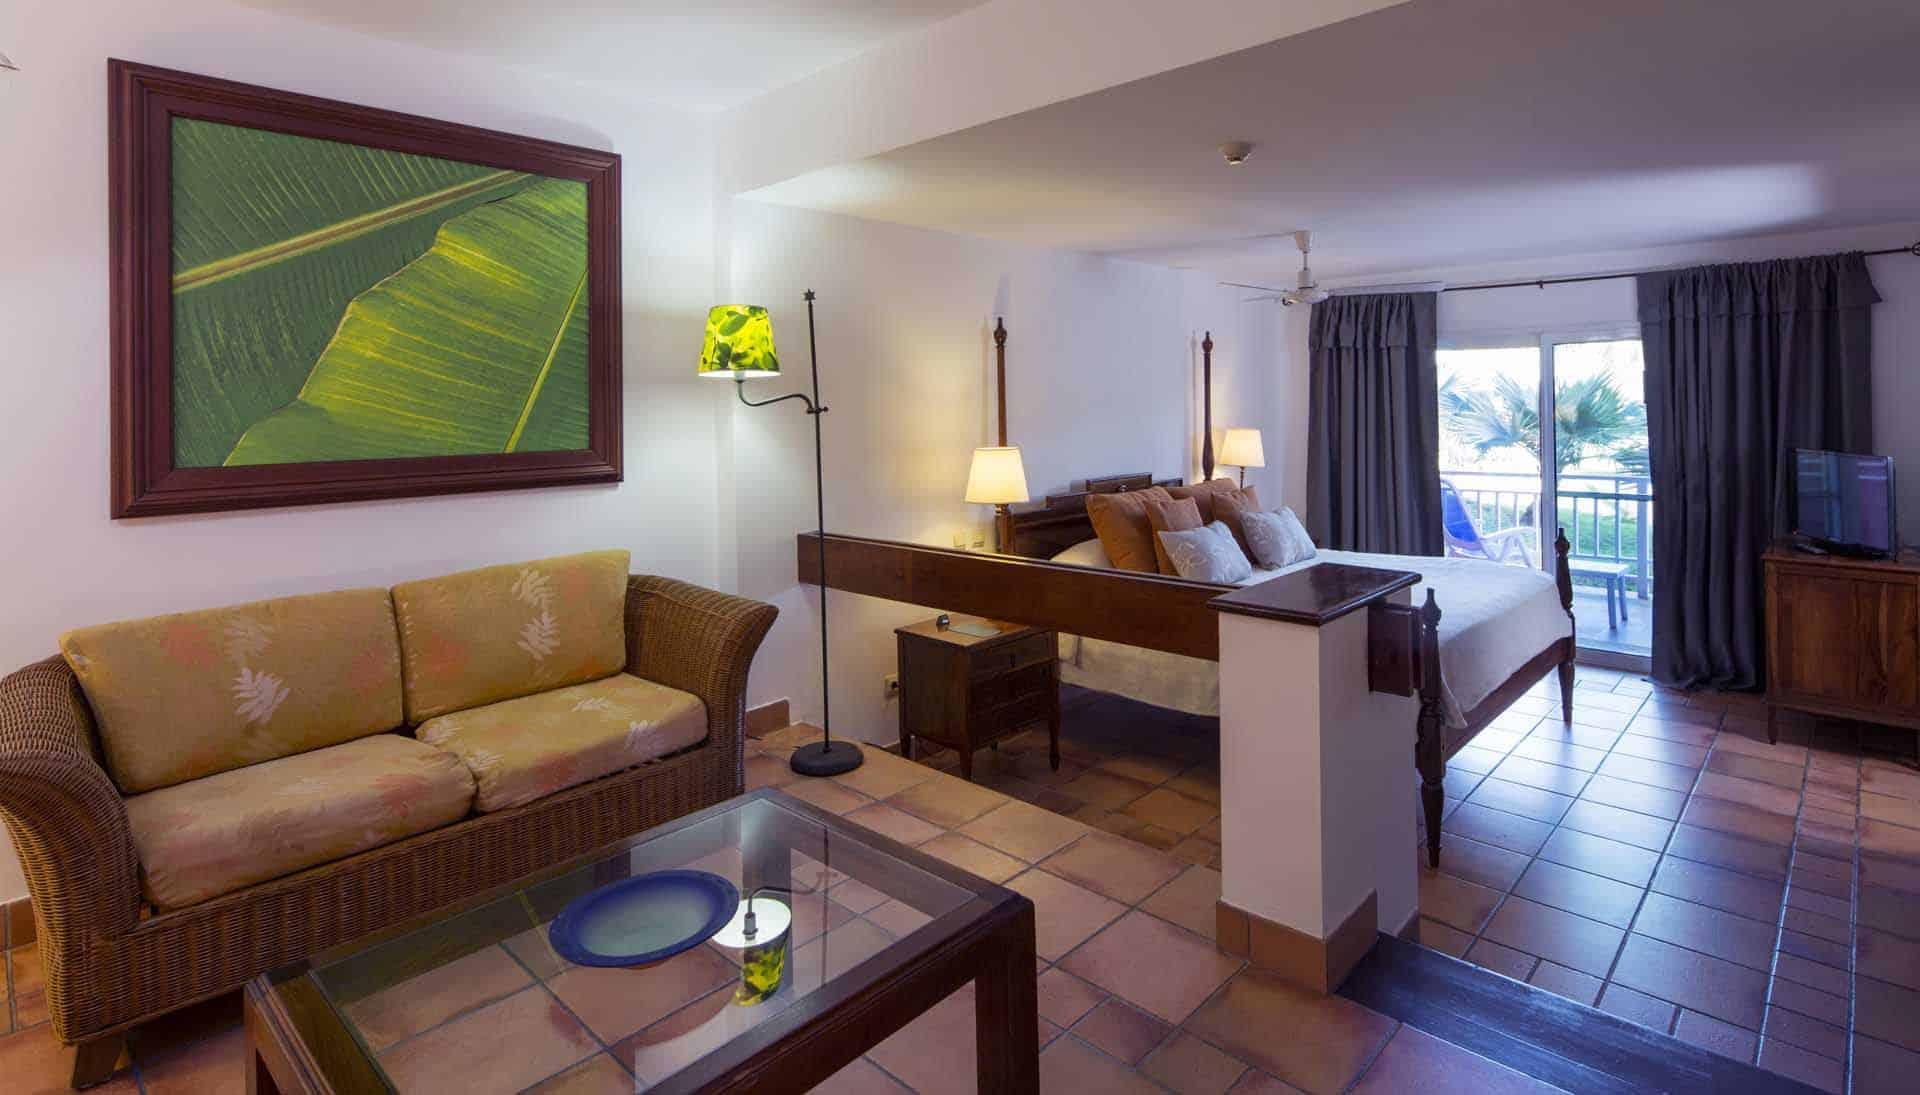 H2417 Hotel Hicacos Varadero 05 cuba autrement